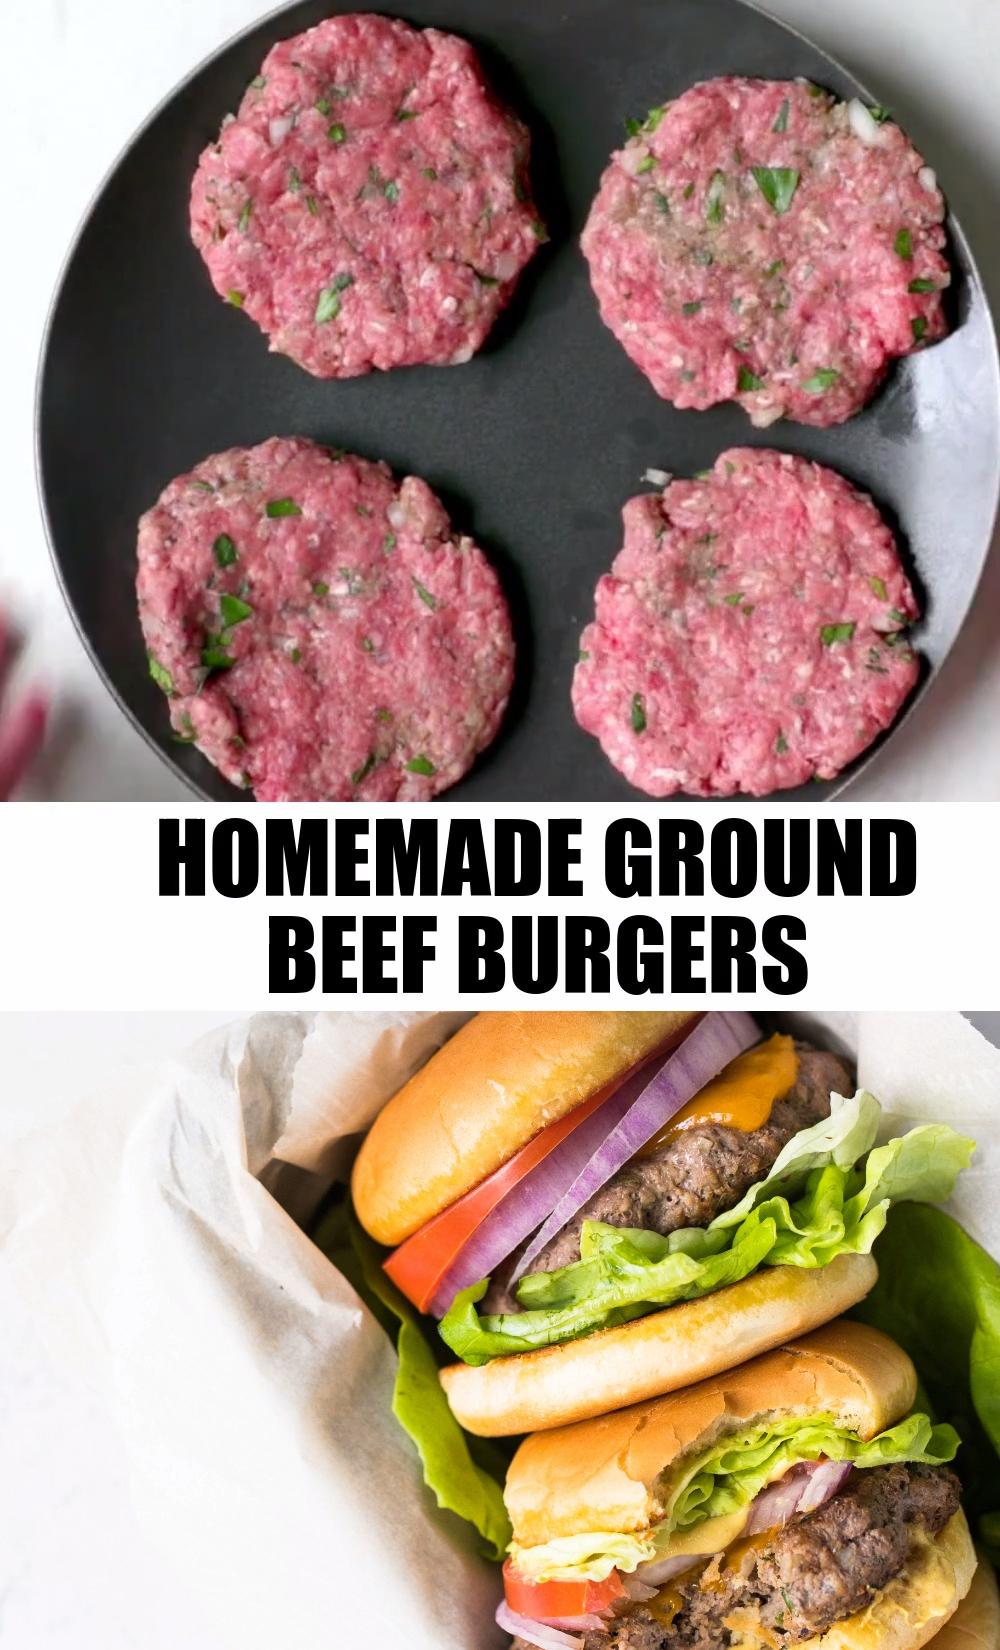 Homemade Ground Beef Burger Patties Simple Ingredients Video Video In 2020 Beef Burgers Patties Burger Recipes Beef Beef Burgers